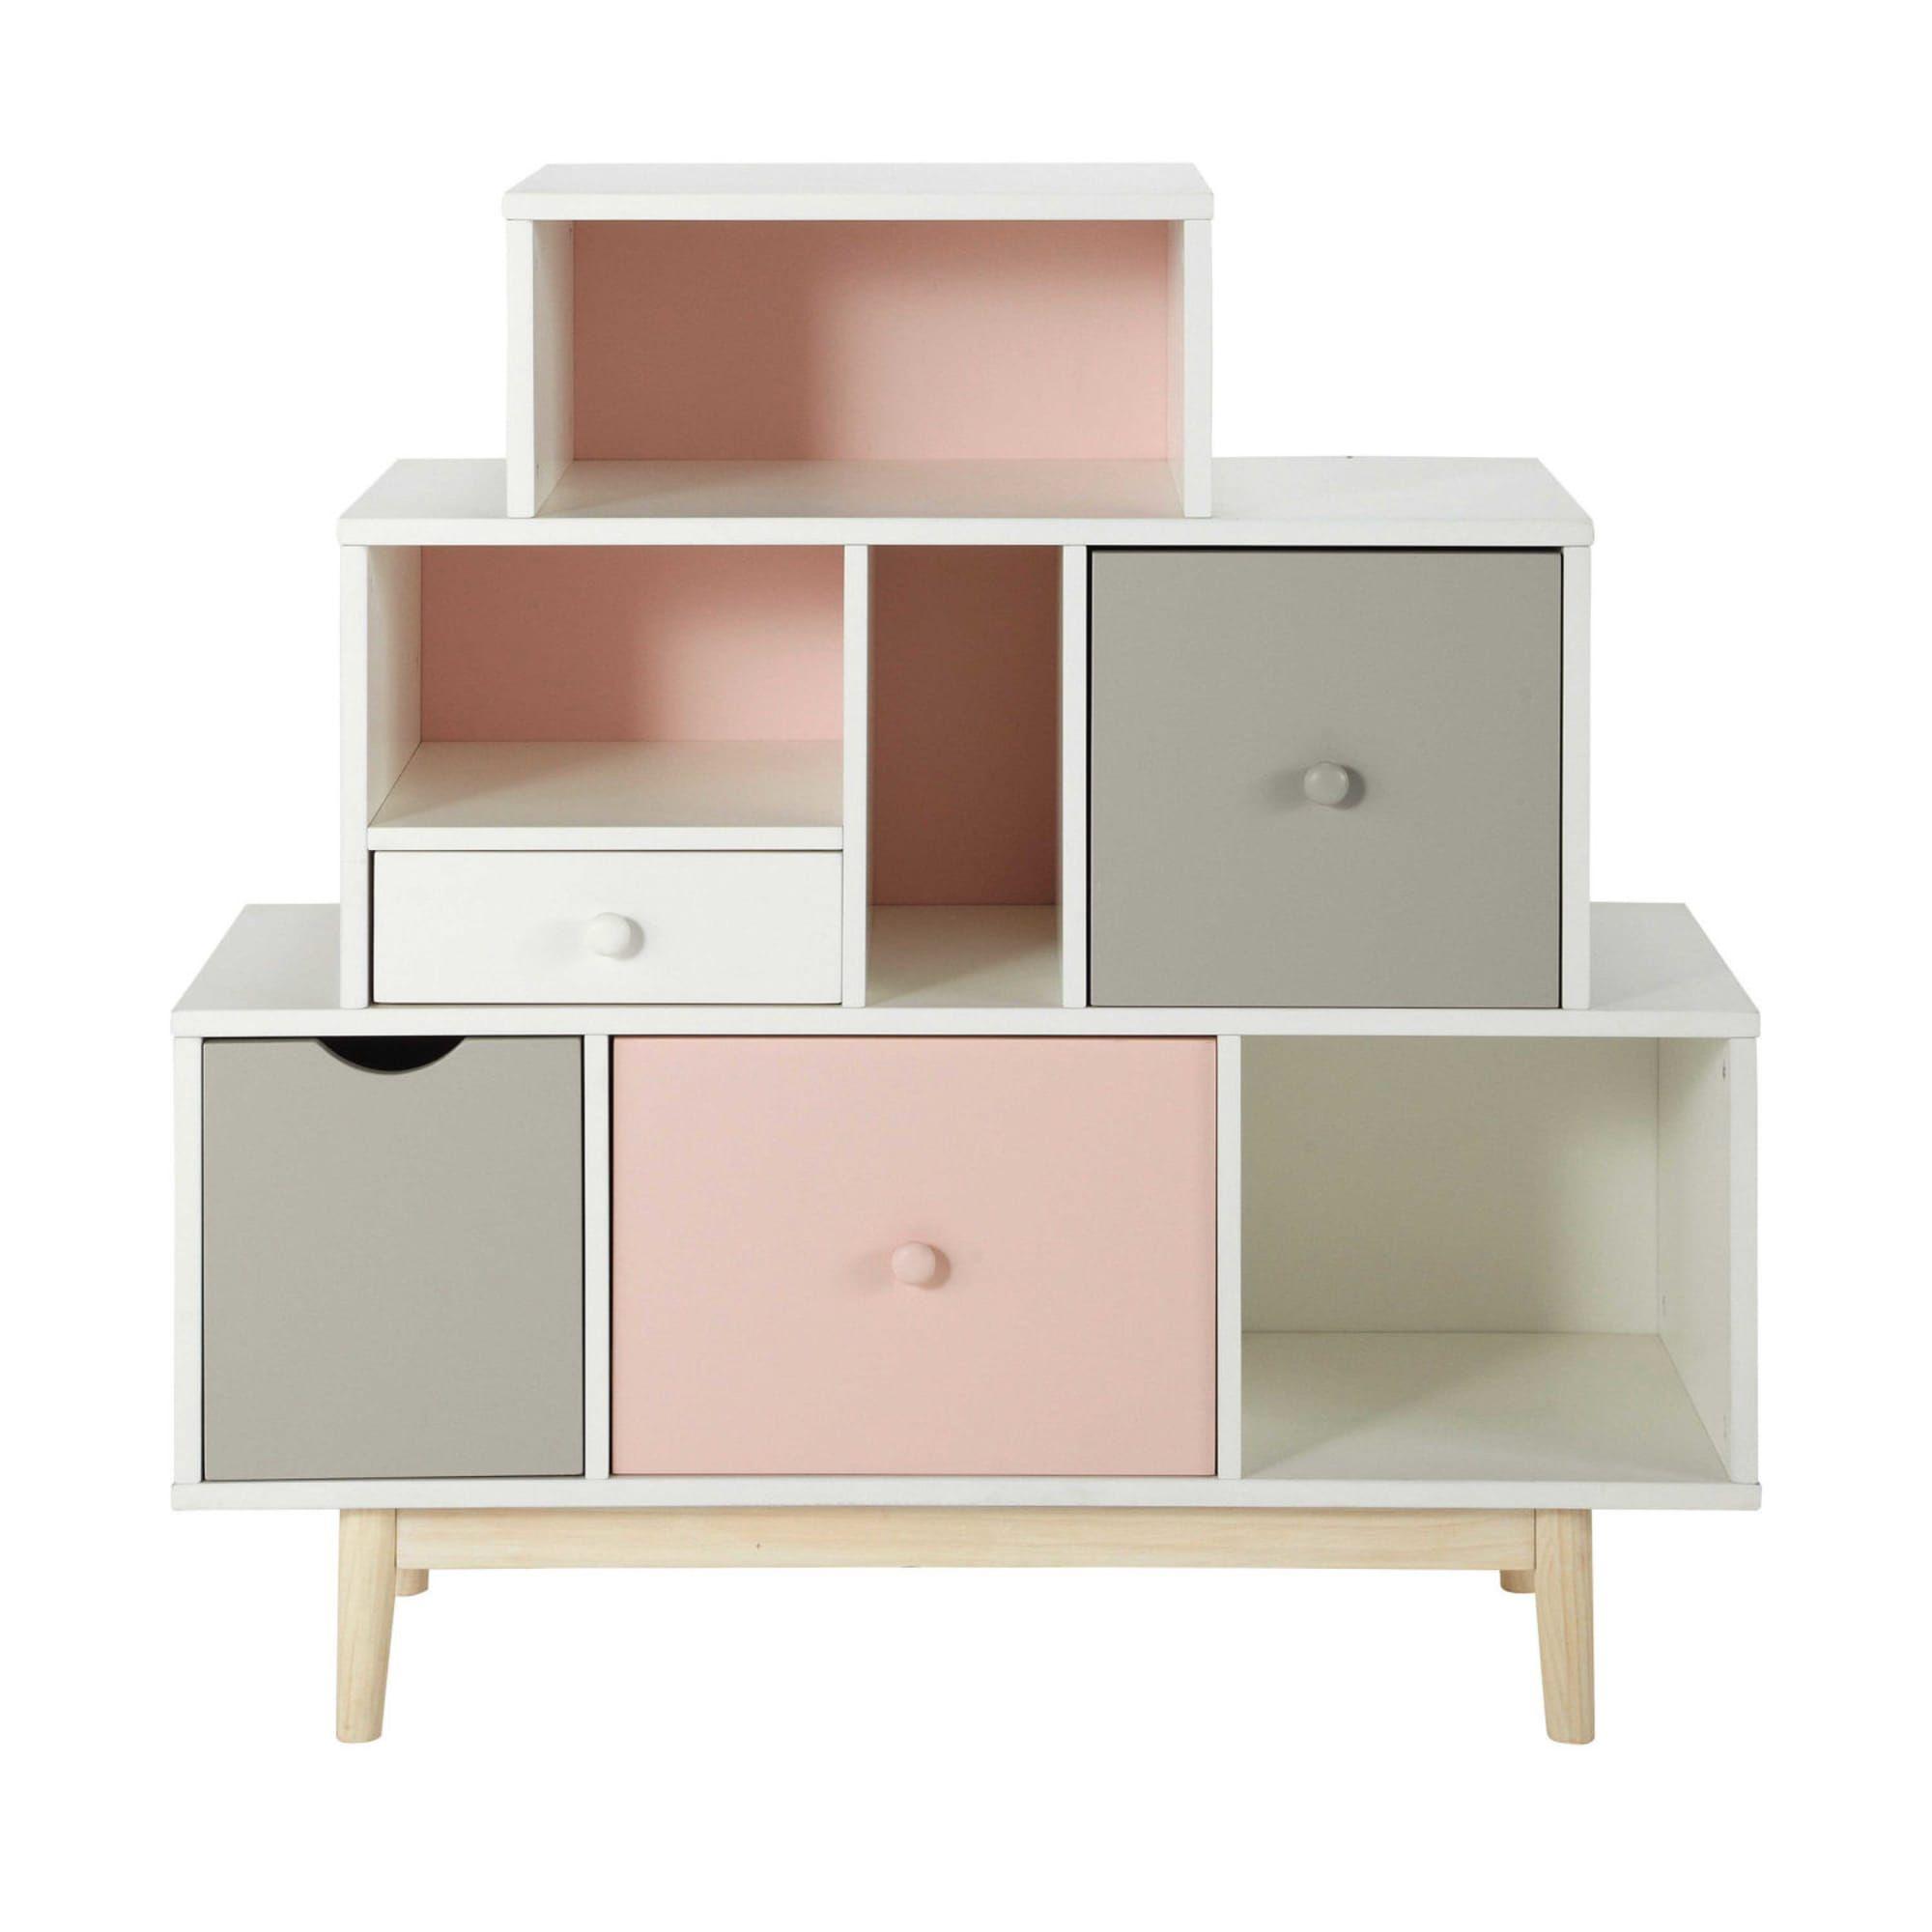 Cabinet de rangement 4 tiroirs blanc, rose et gris | Cabinet de rangement, Meuble rangement ...